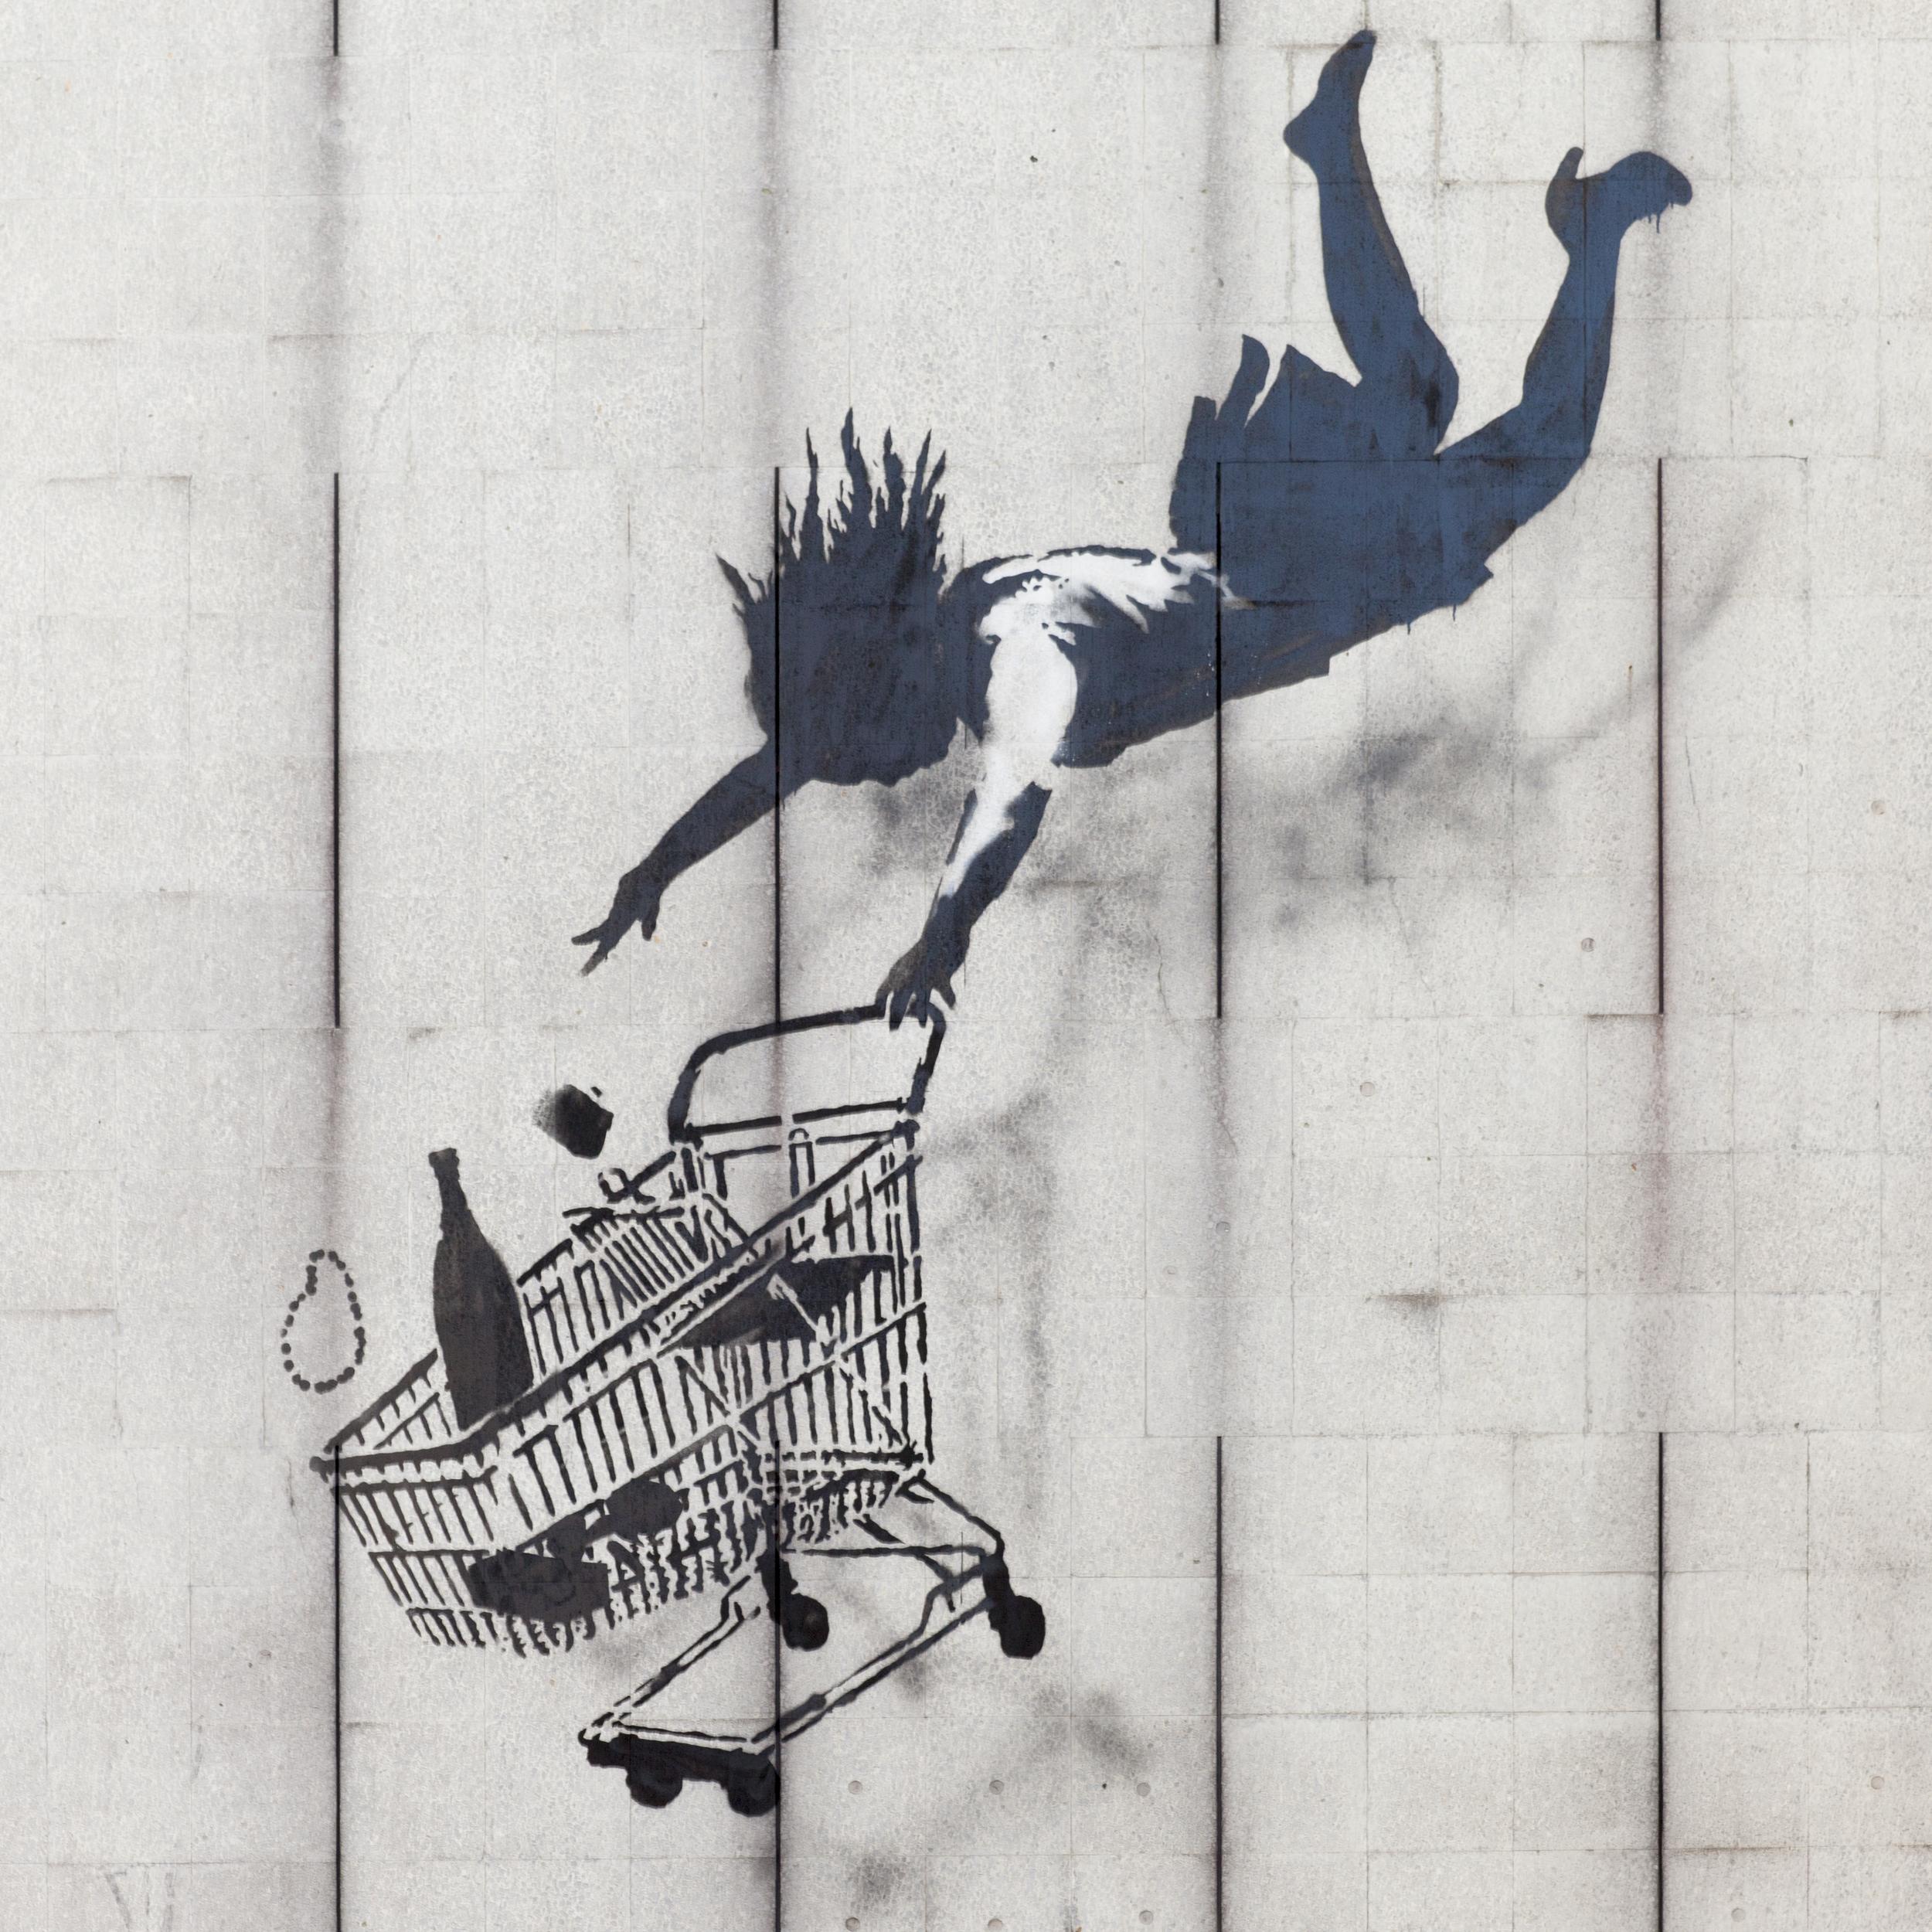 Shop_Until_You_Drop_by_Banksy.JPG